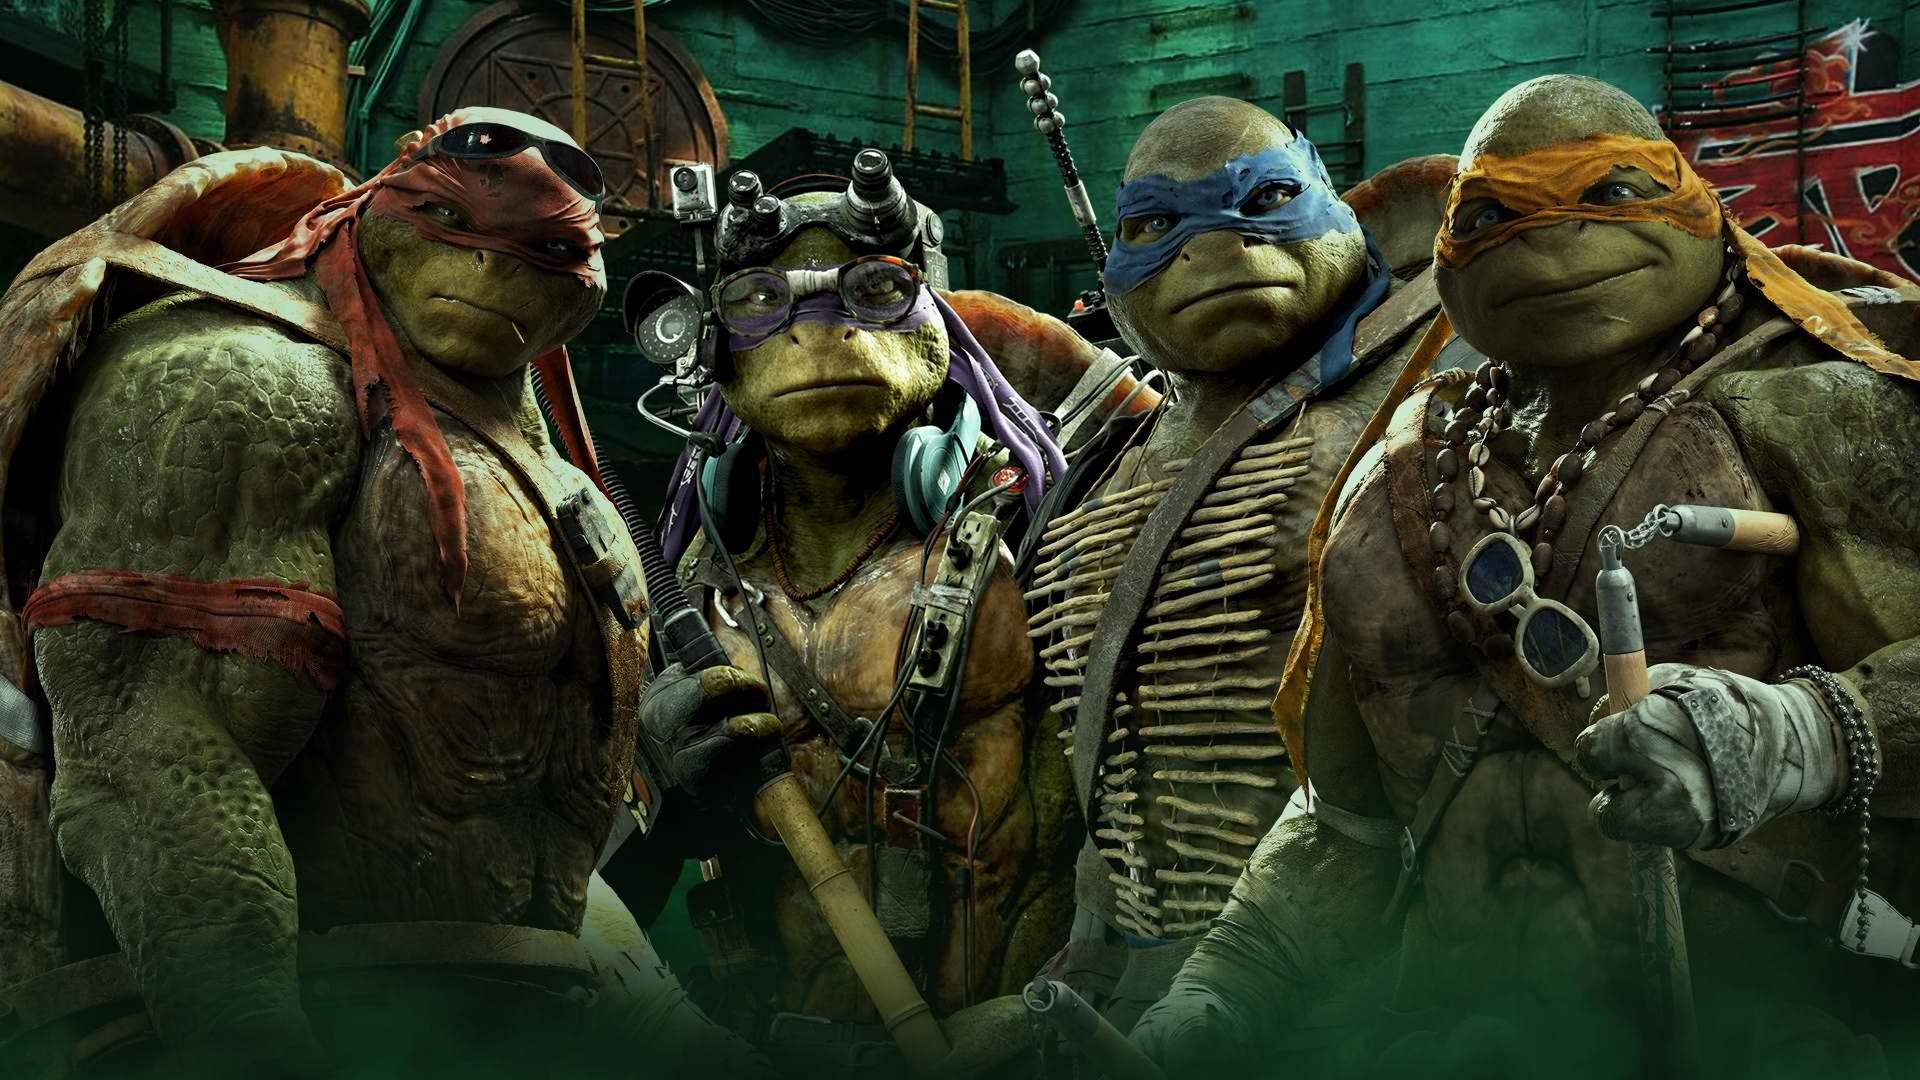 Teenage Mutant Ninja Turtles 2014 Character Posters   Wallpapers .